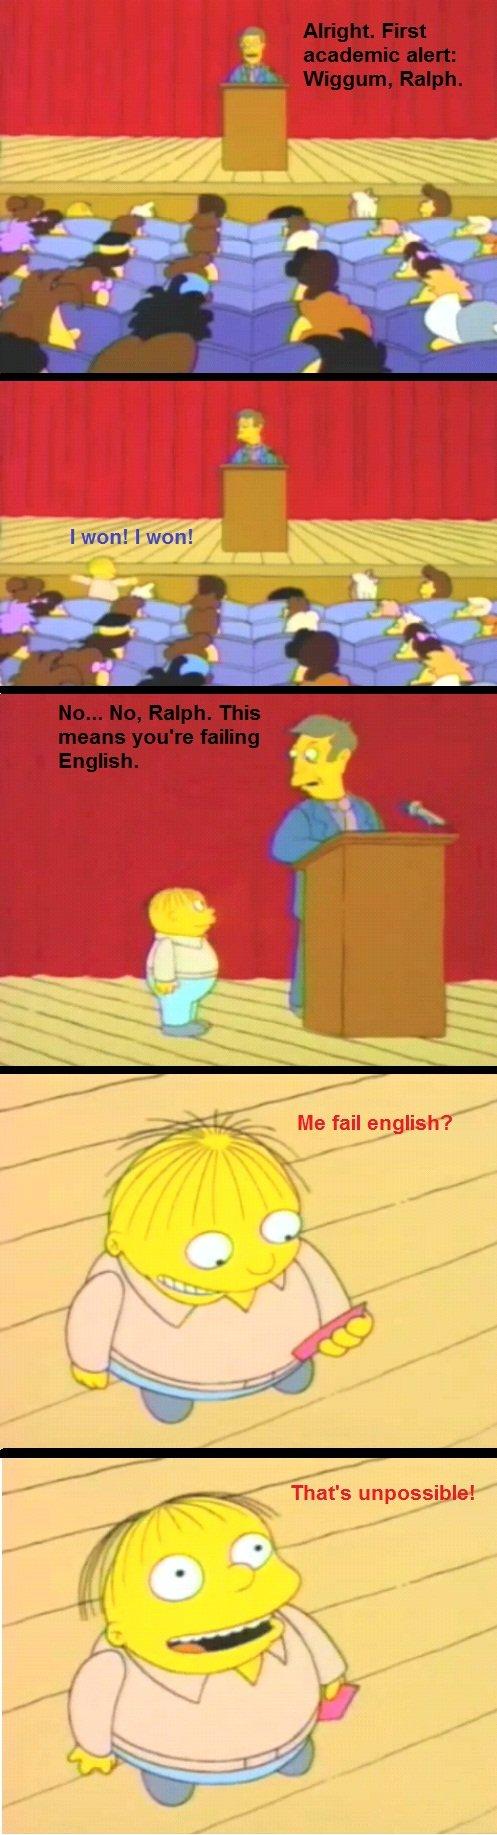 I love Ralph pt.3. Part 1: www.funnyjunk.com/funny_pictures/1676965/I+love+Ralph+pt+1/ Part 2: www.funnyjunk.com/funny_pictures/1814530/I+love+Ralph+pt+2/. i Love ralph